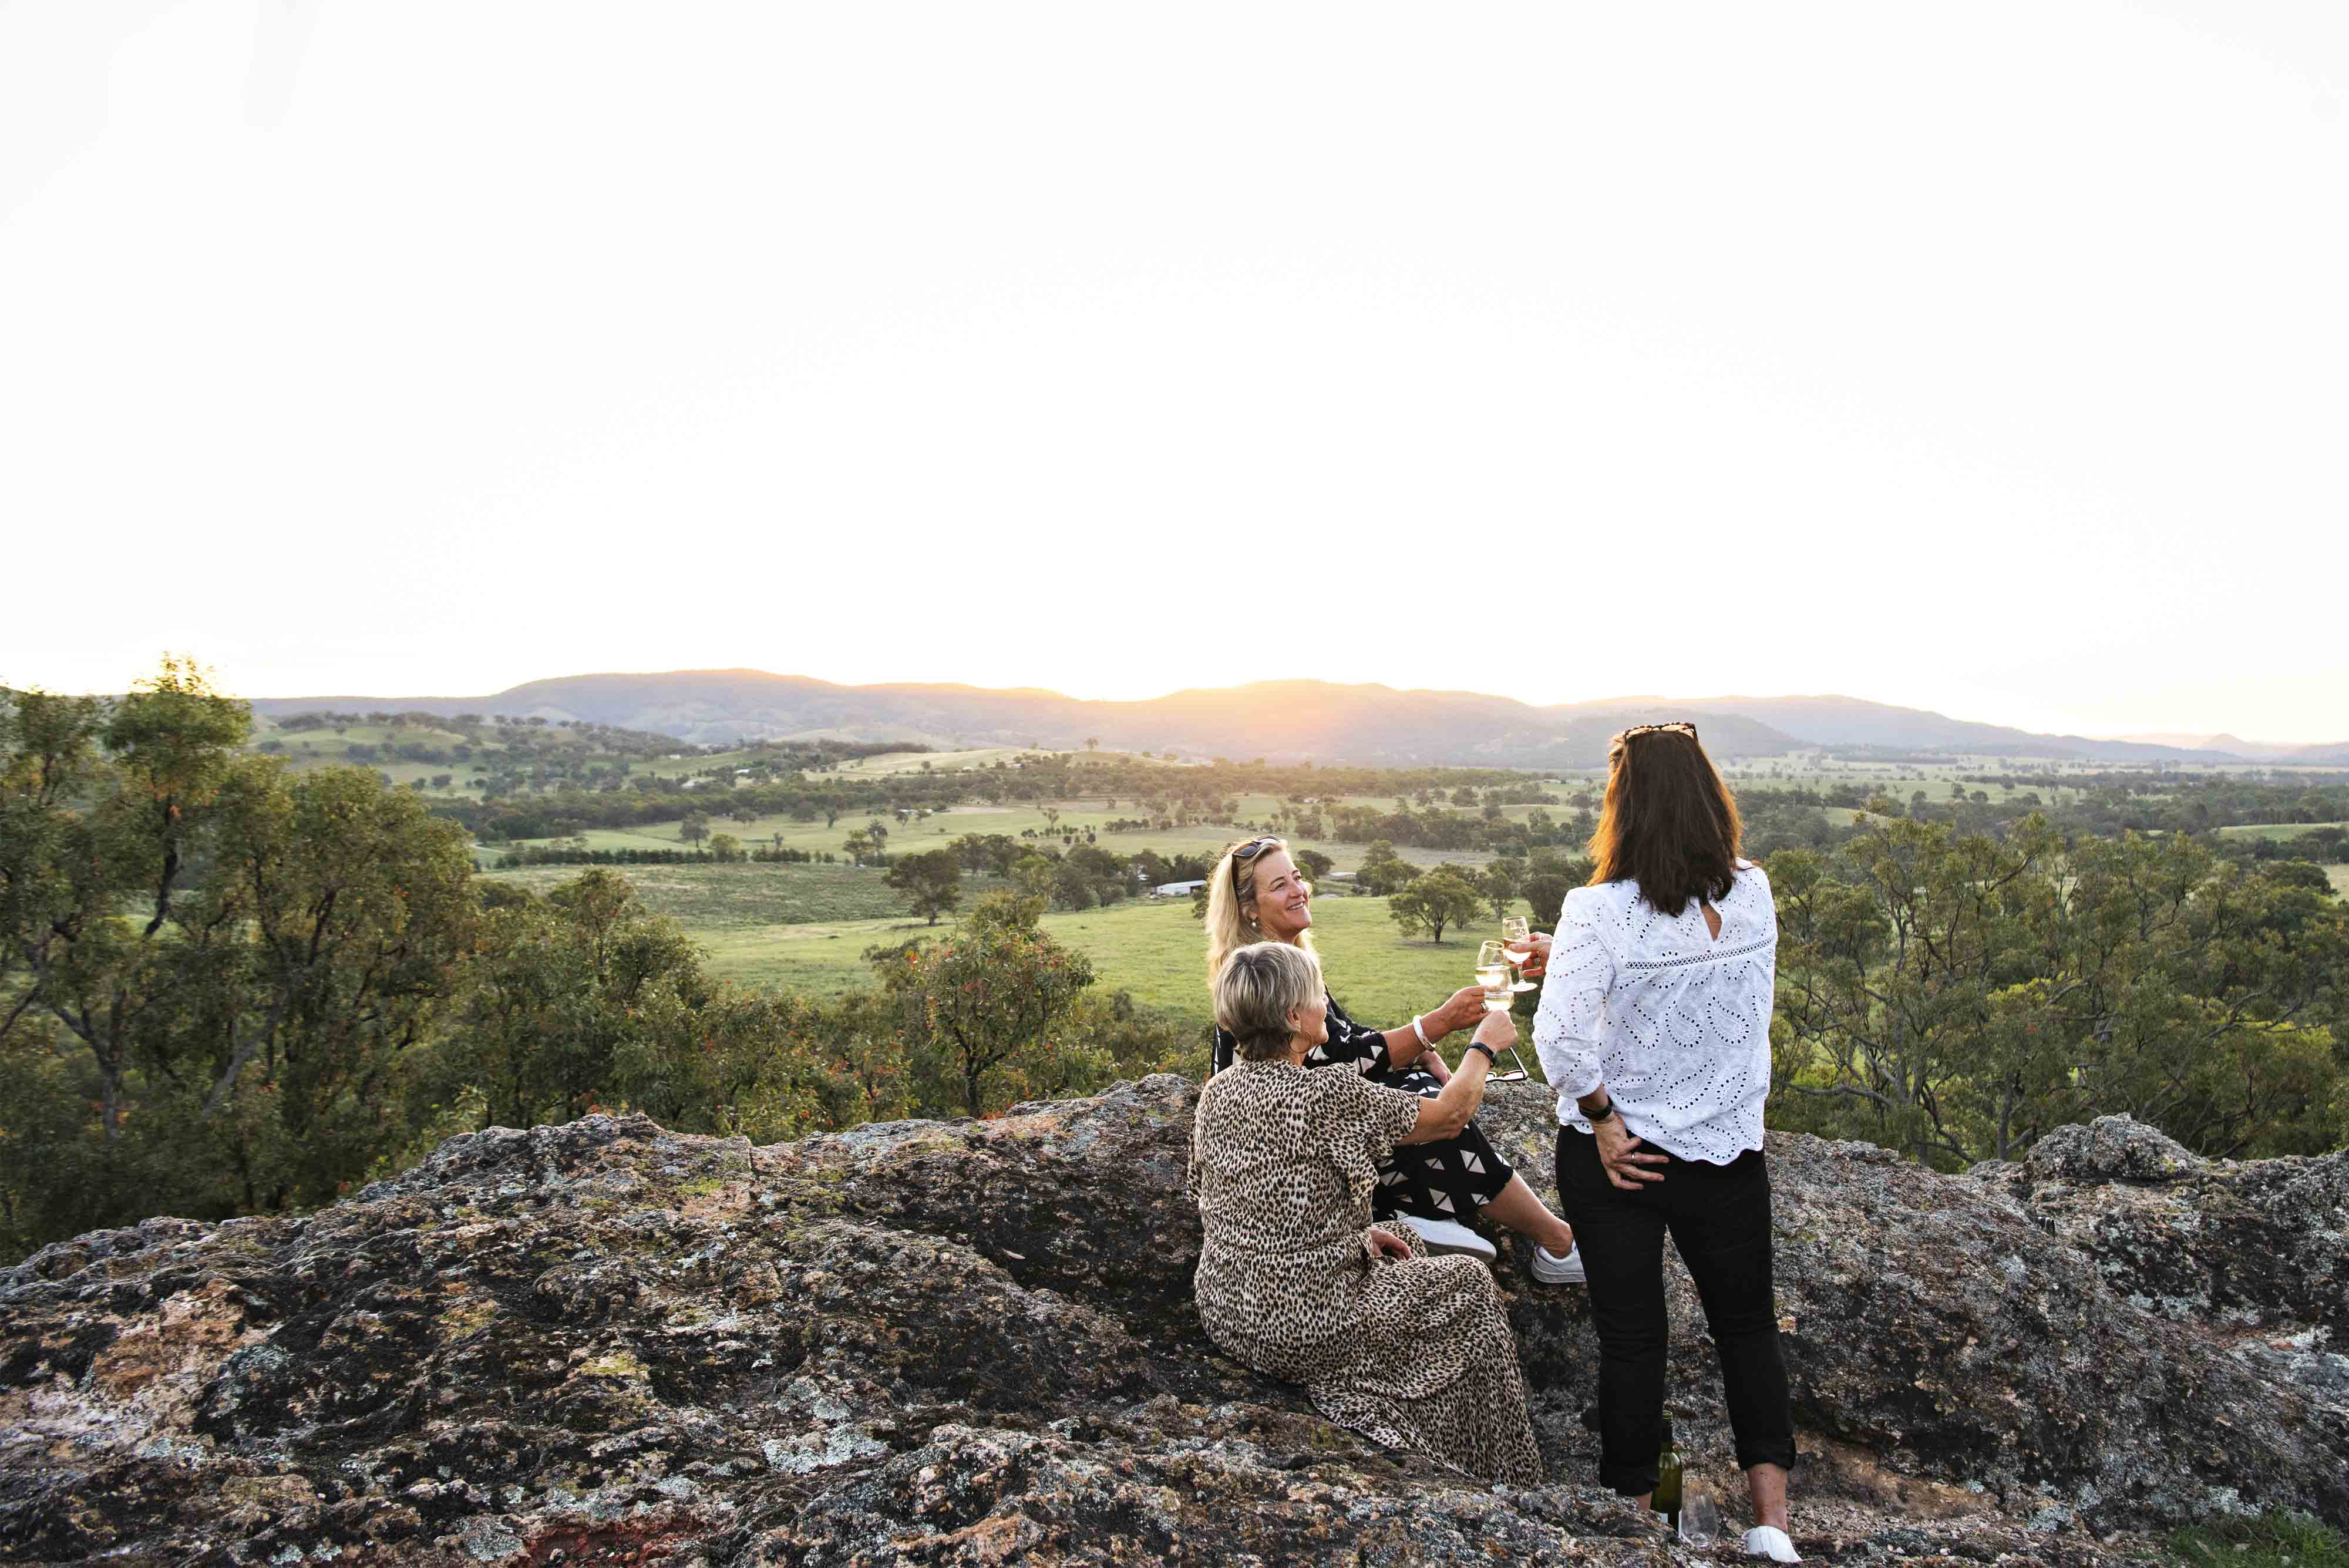 ODD FROG LODGES mudgee lue rocks caves explore bushwalks sunset picnic